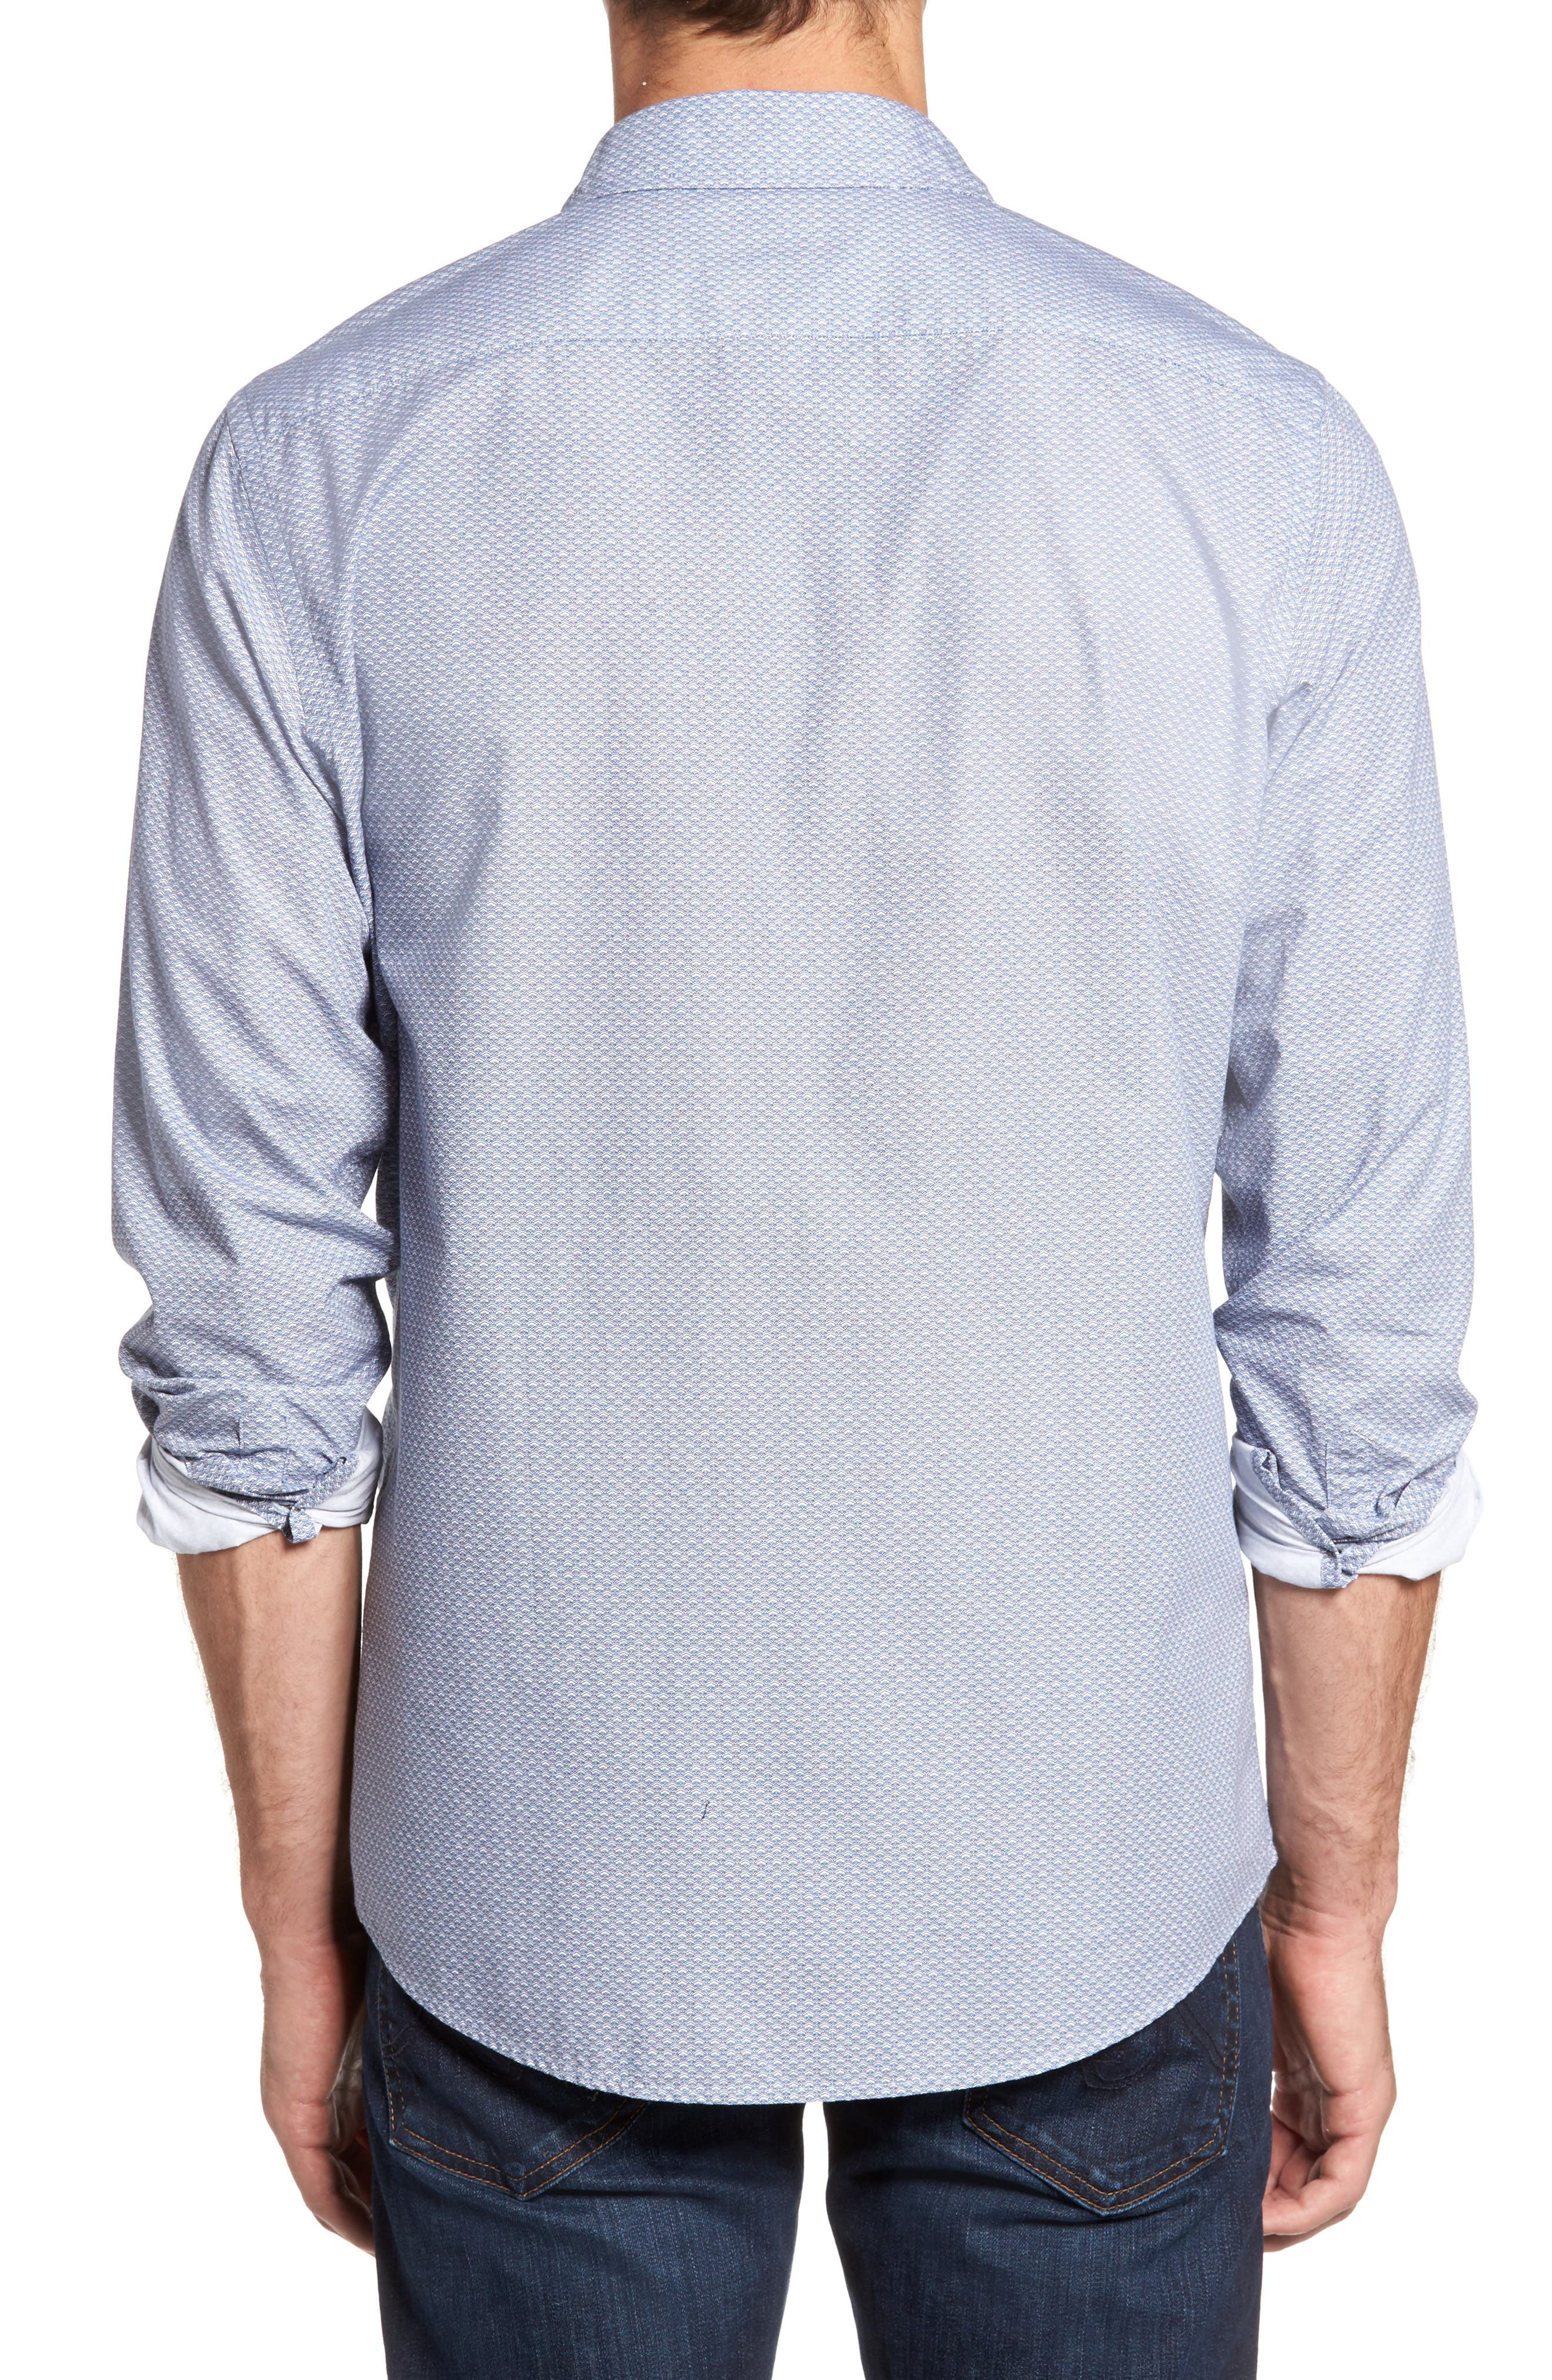 Macauley Sports Fit Print Sport Shirt,                             Alternate thumbnail 2, color,                             423